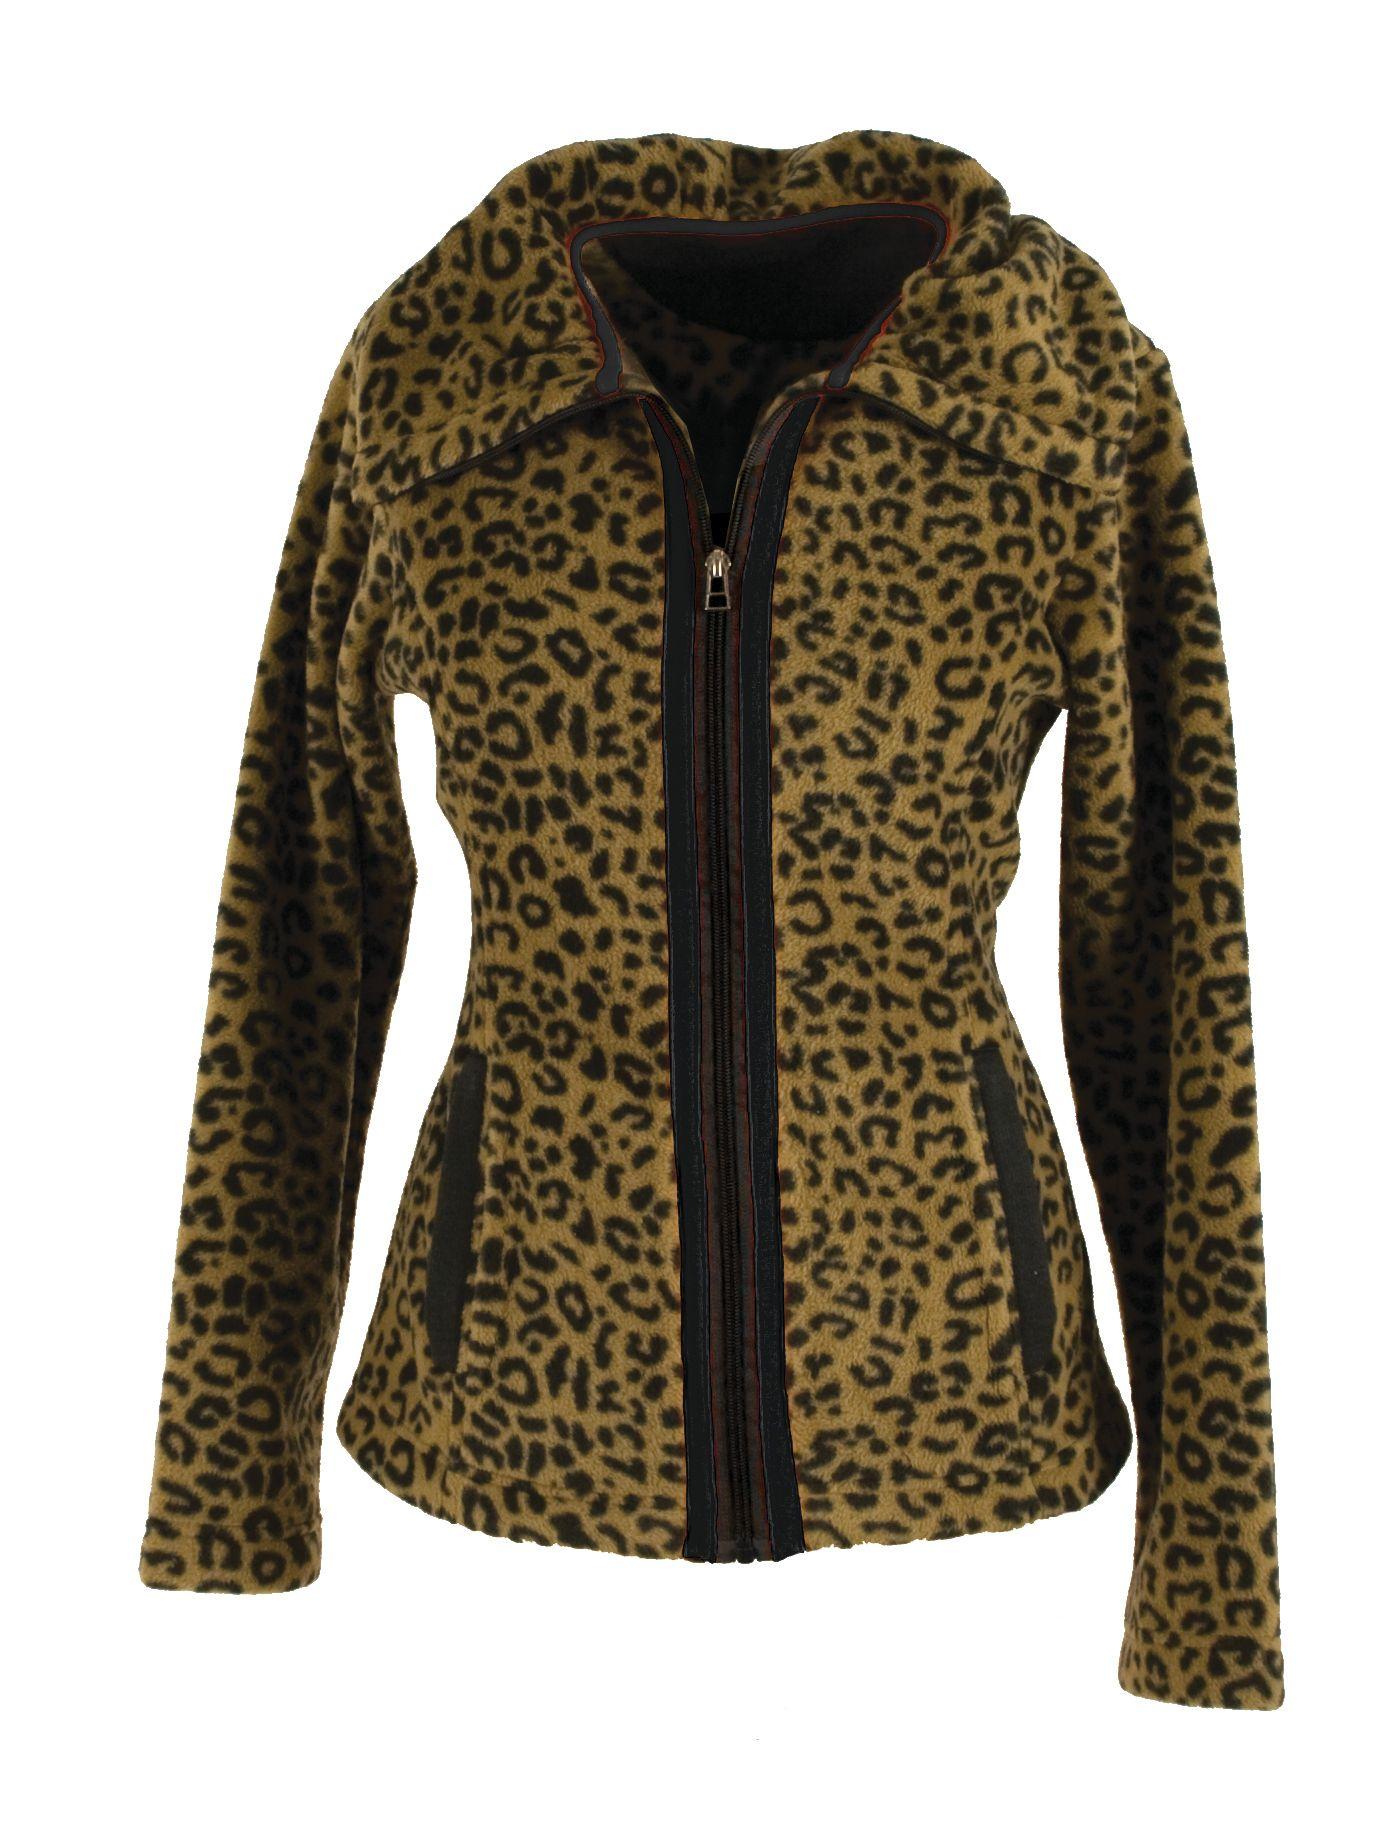 Horseware Ladies Newmarket Leopard Camille Jacket